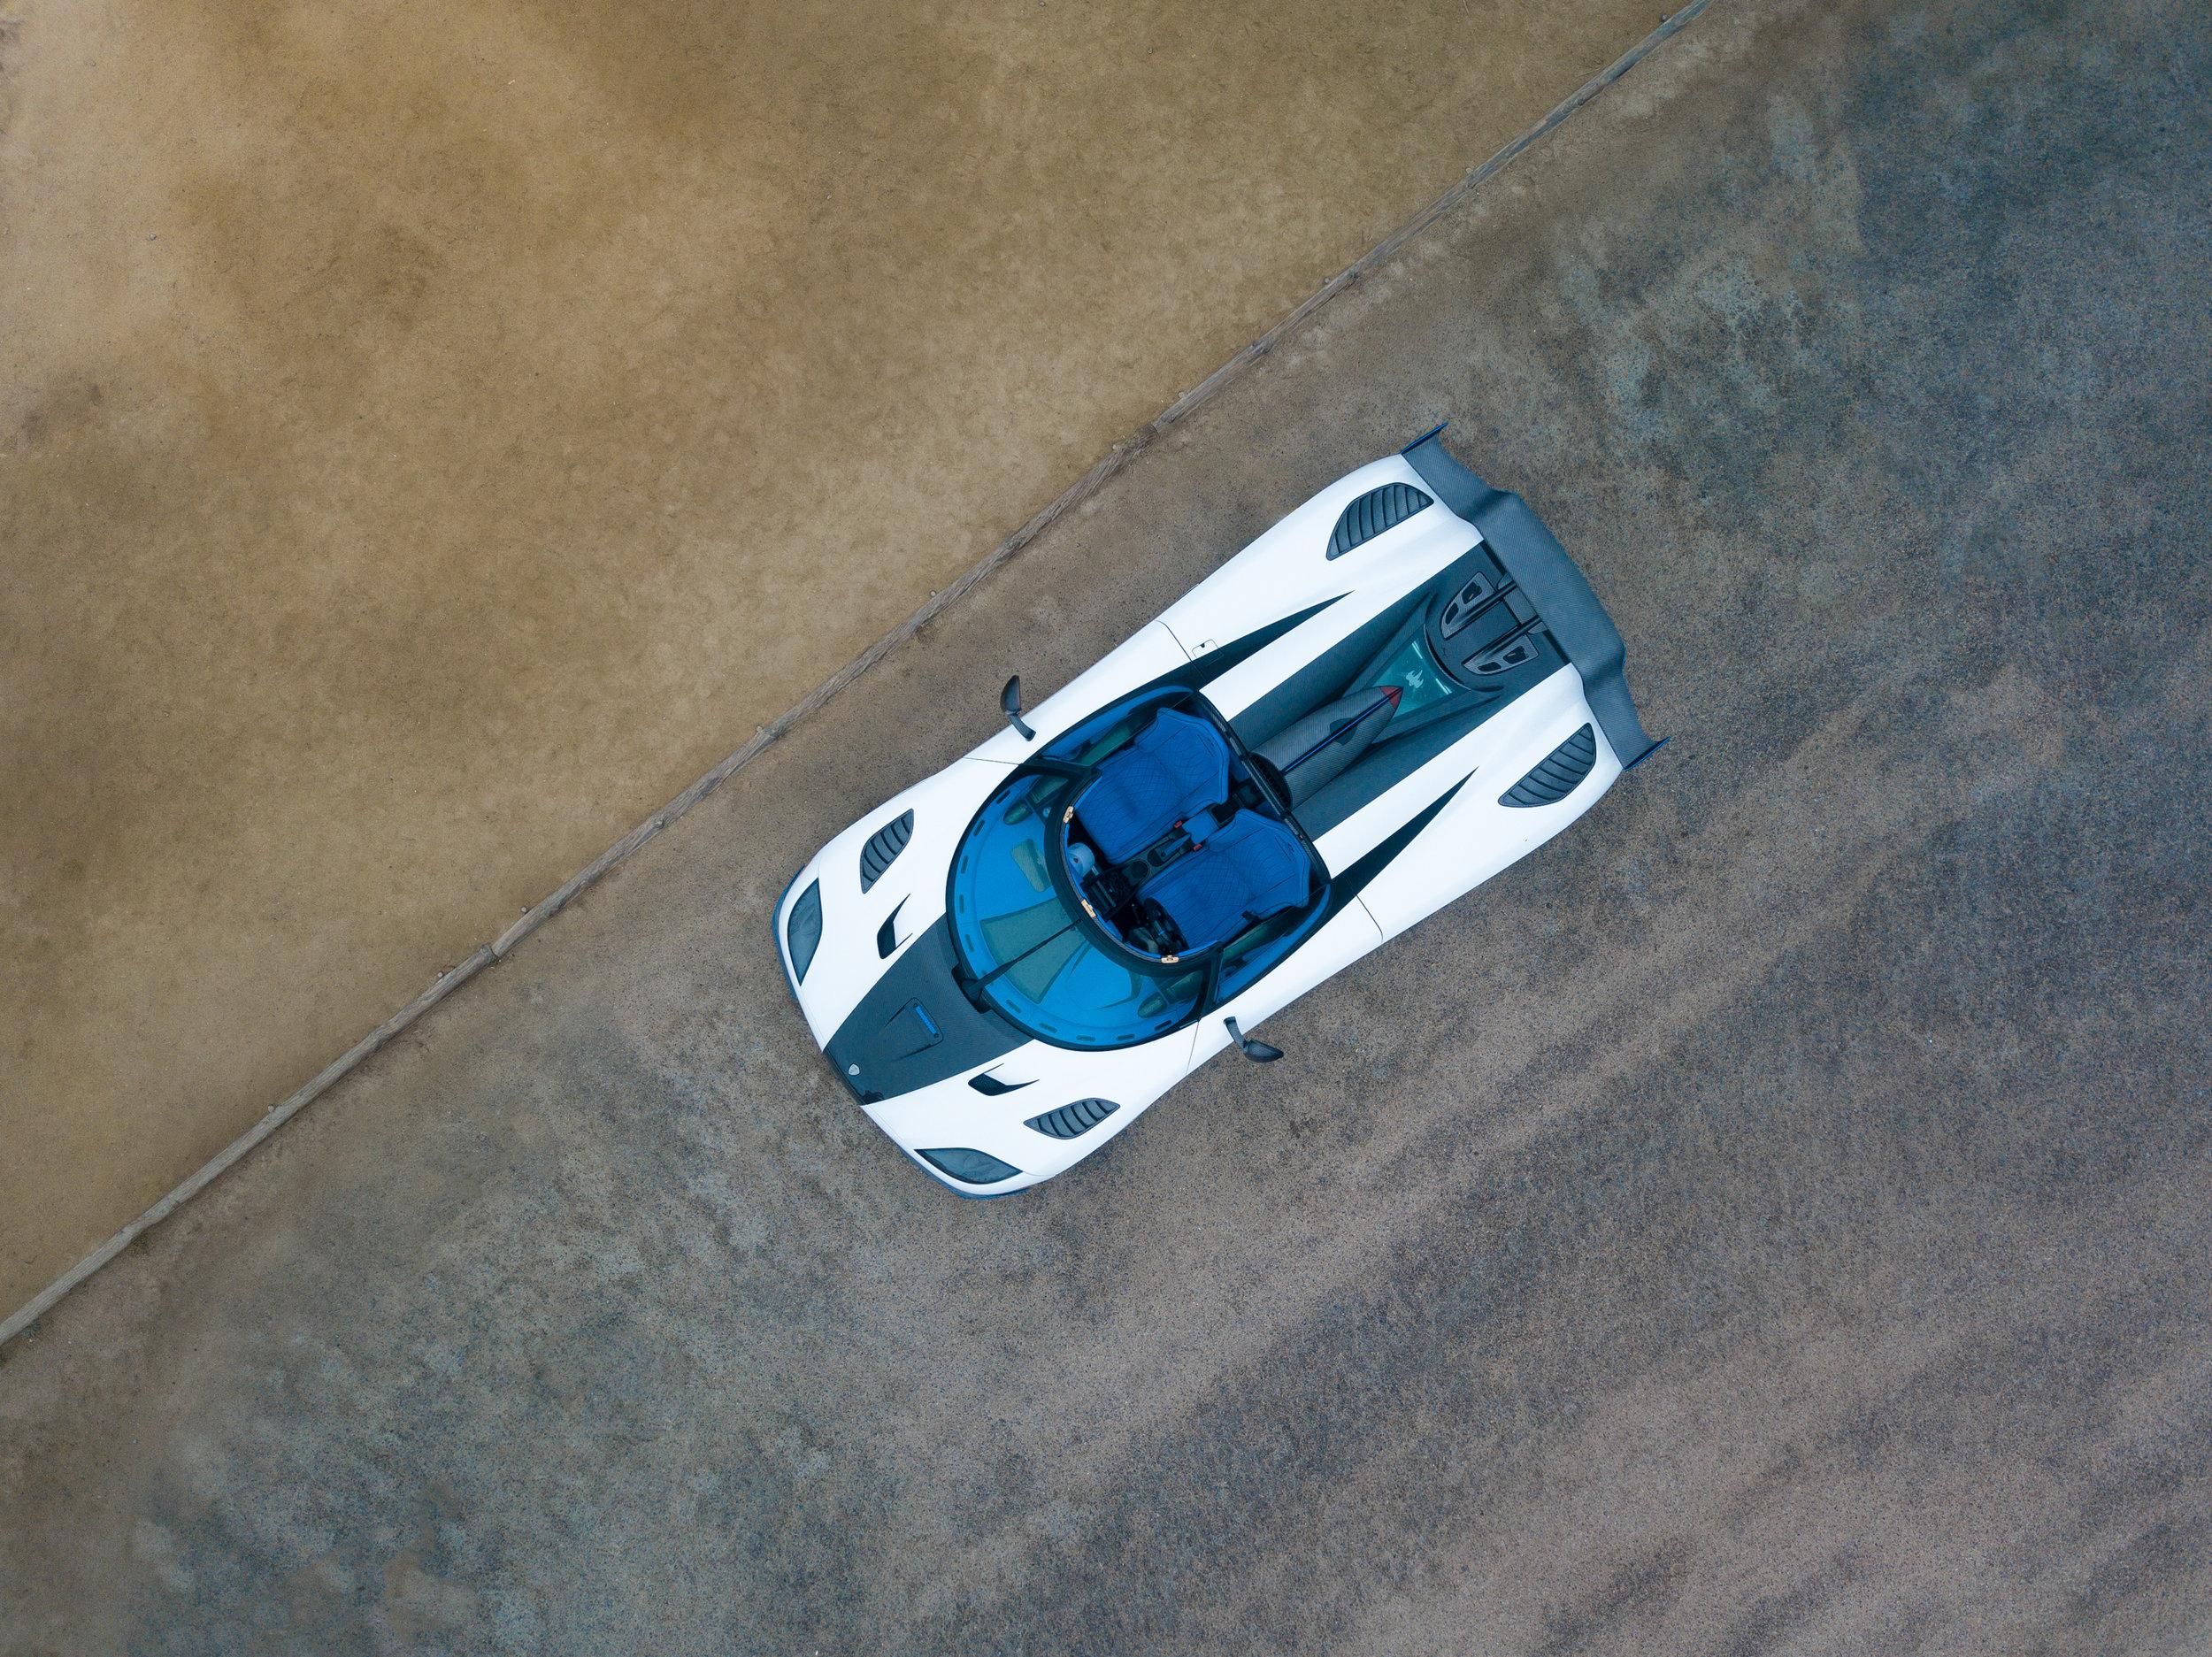 Stay_Driven_Monterey_Car_Week_Koenigsegg_Drone-1.jpg